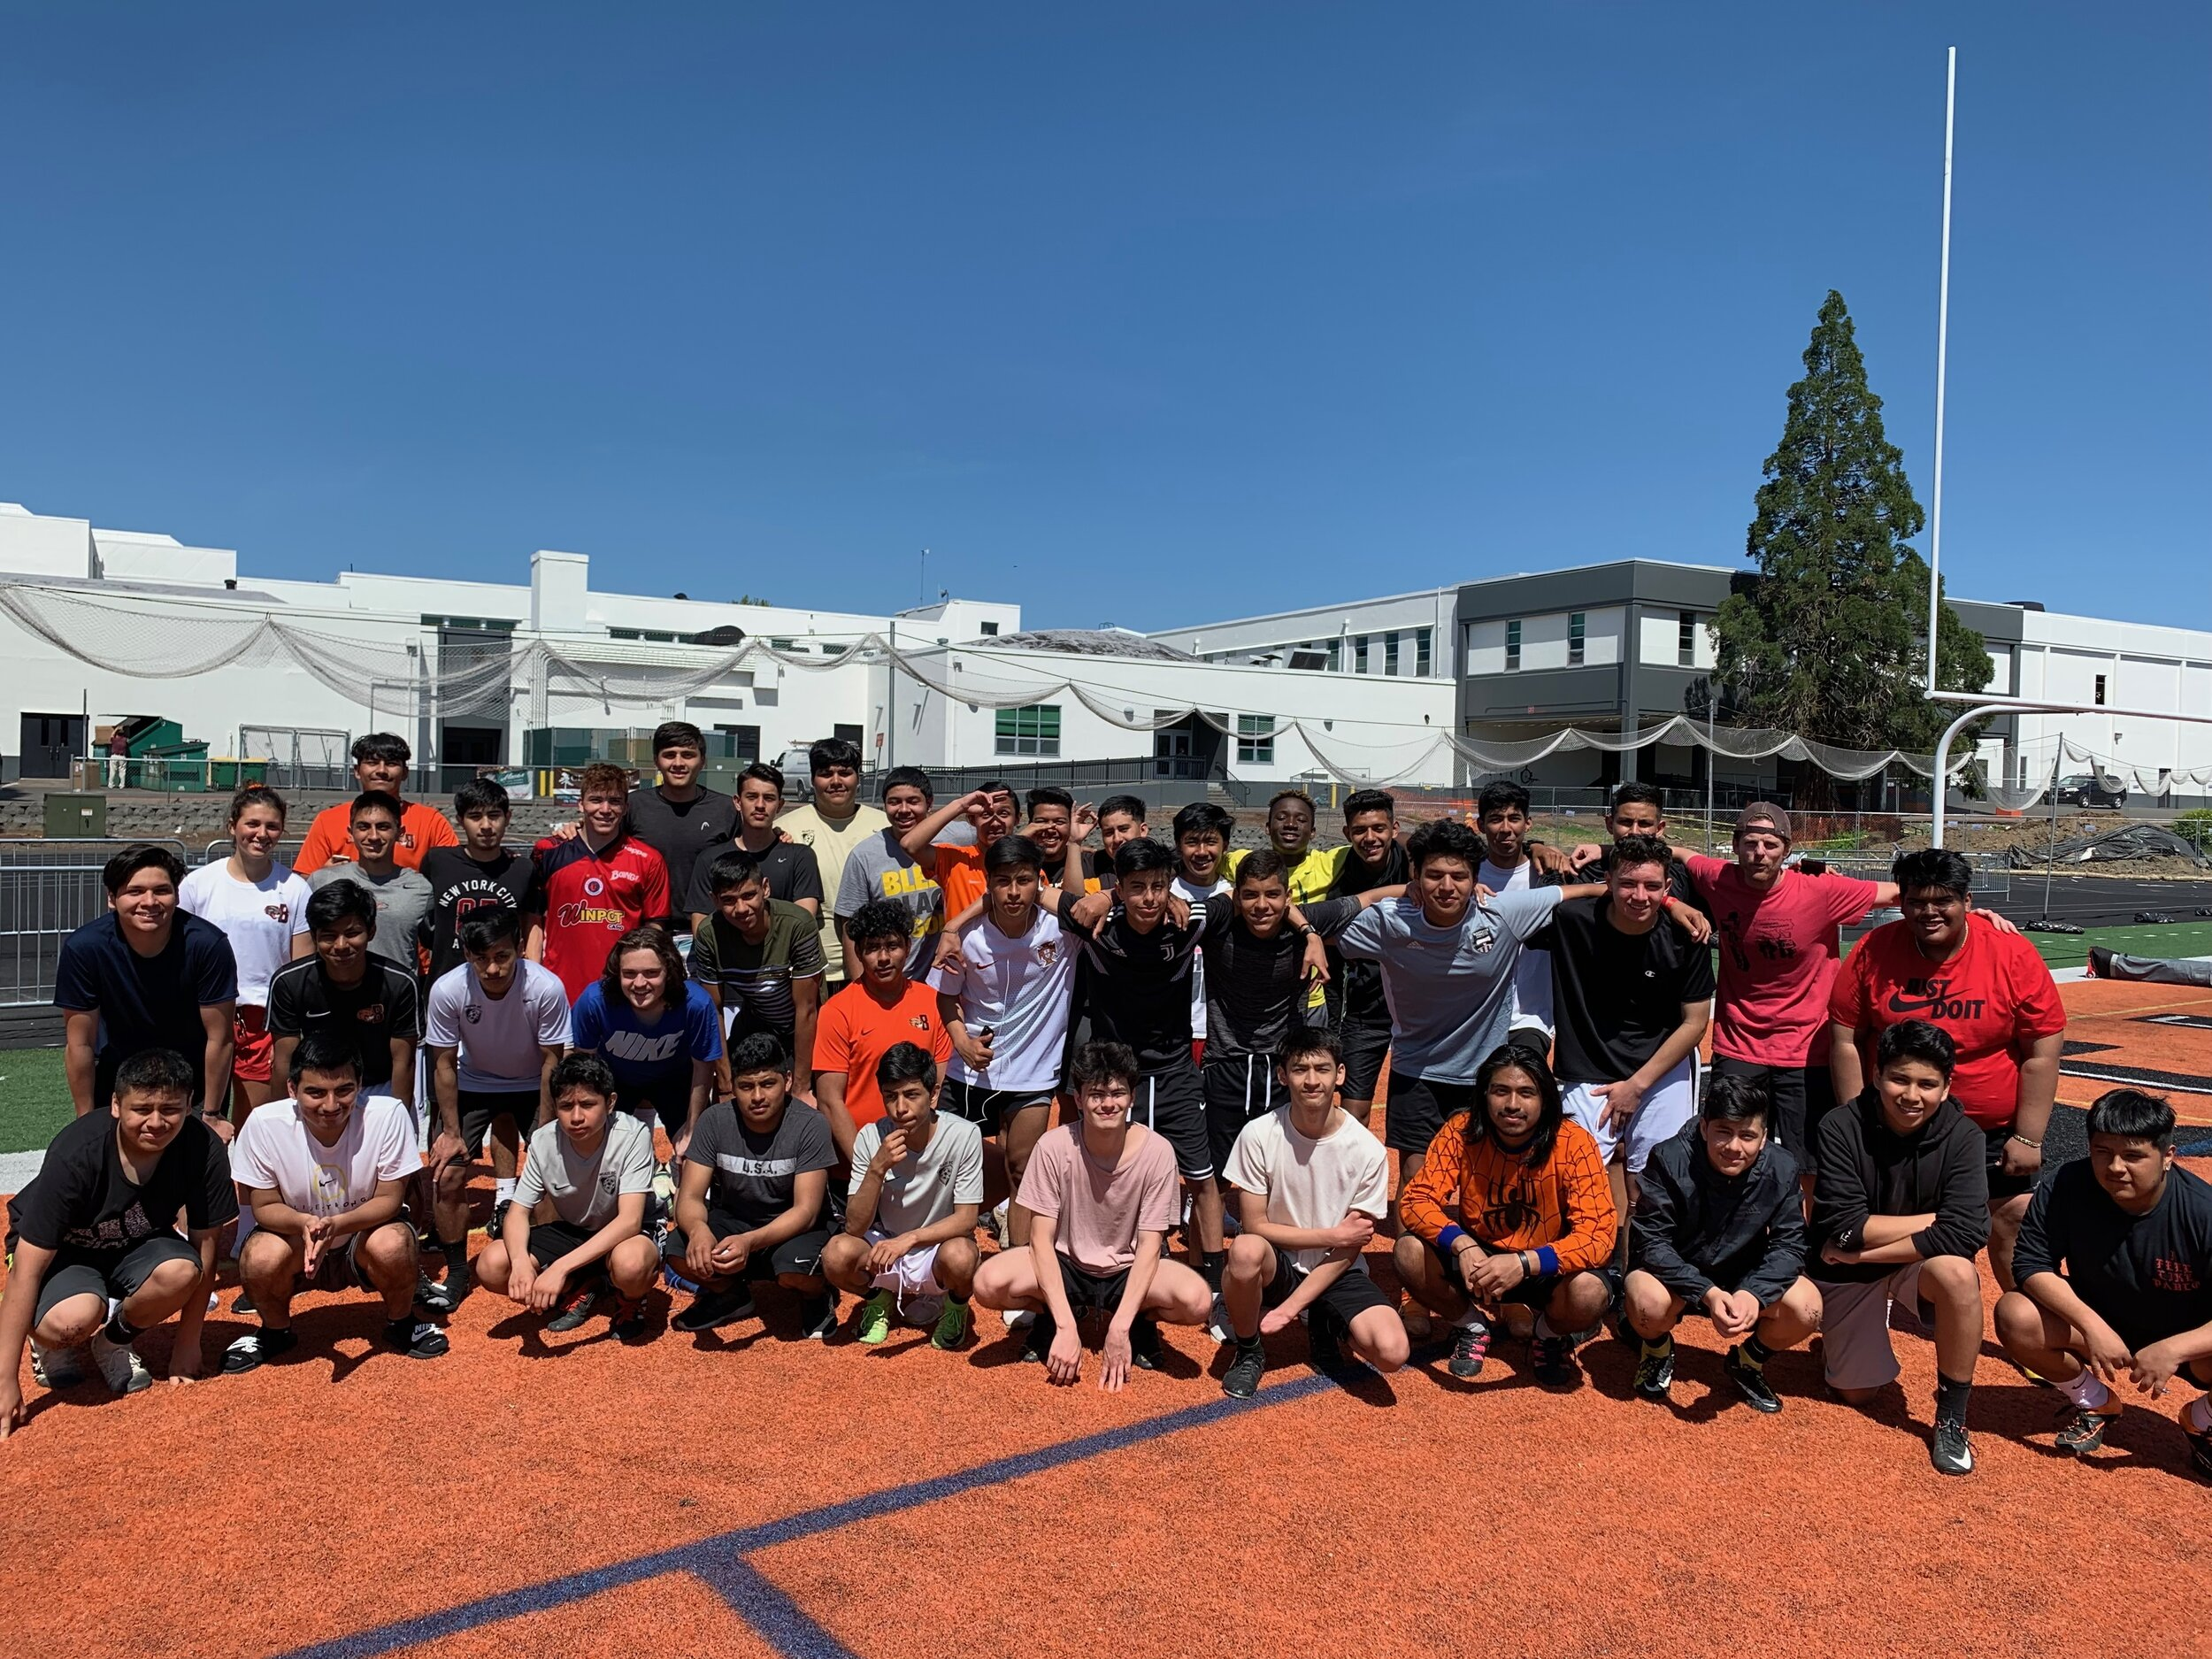 The '18-'19 boys MCFC program